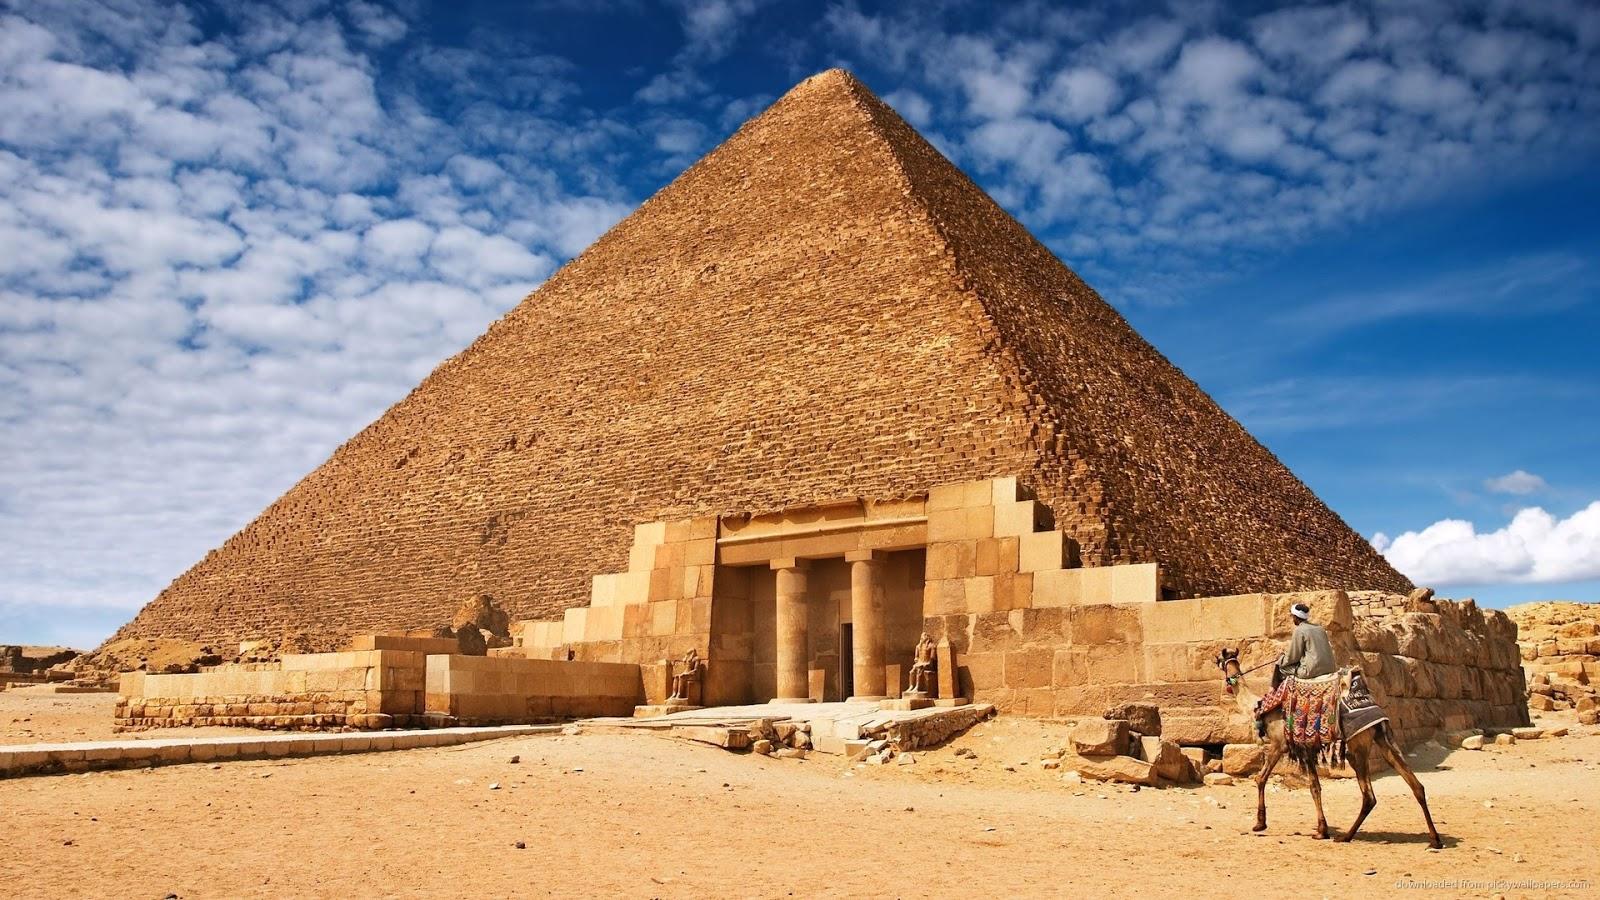 Ancient pyramids of Egypt: history, description and secrets 42